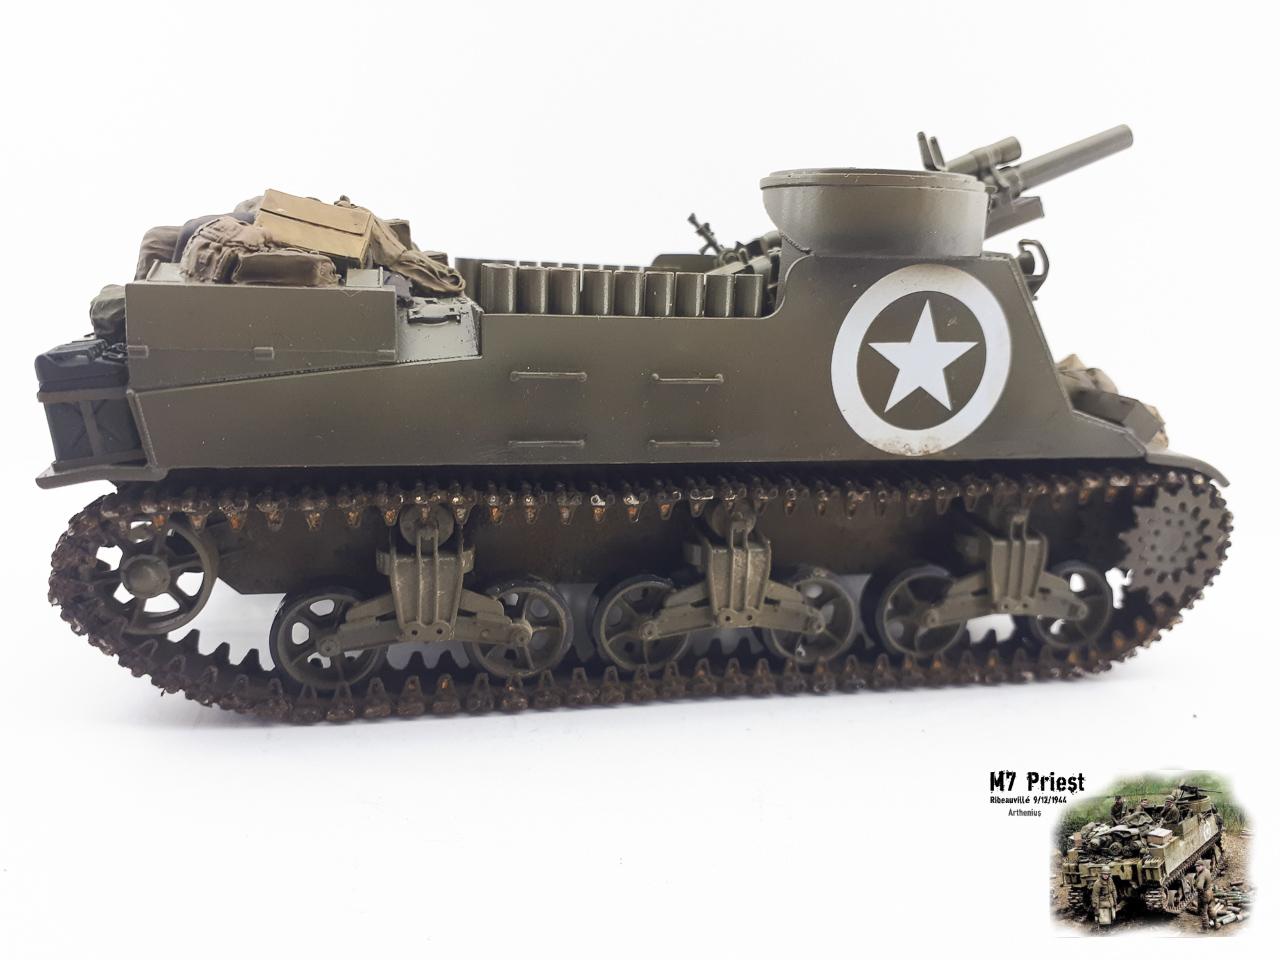 M7 Priest Ribeauvillé 9/12/1944 - Page 2 2018-103